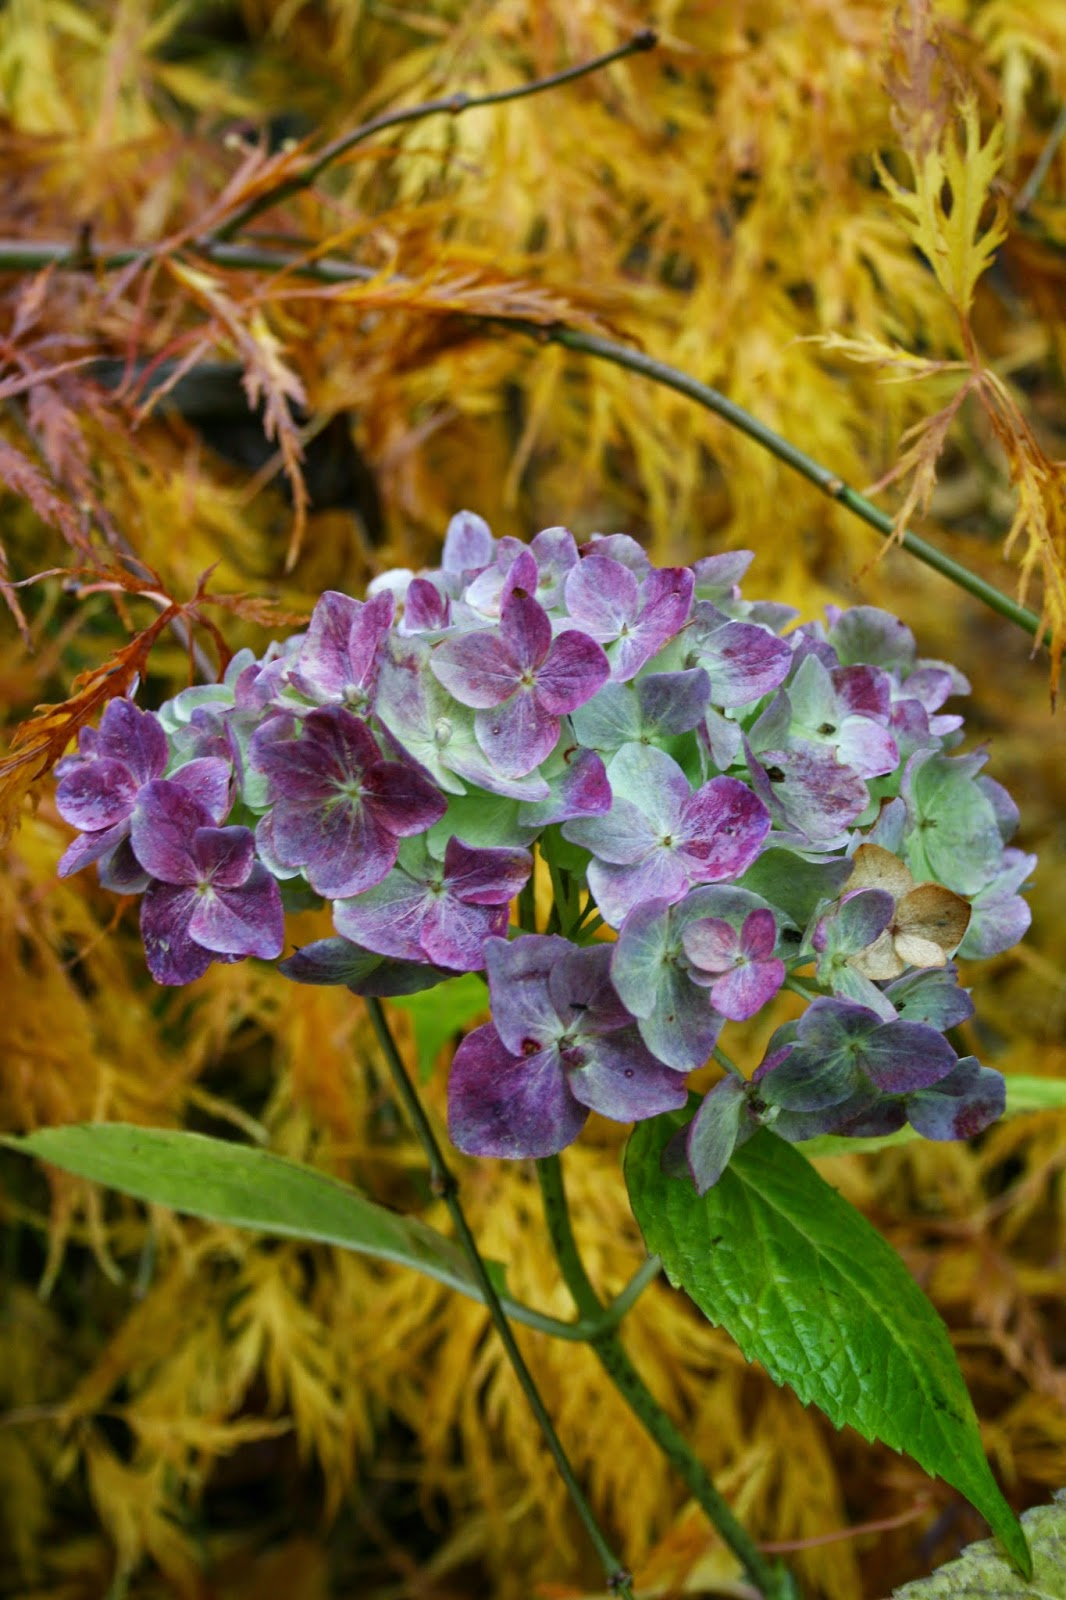 Trädgårdshortensia Hydrangea macrophylla 'The Bride'